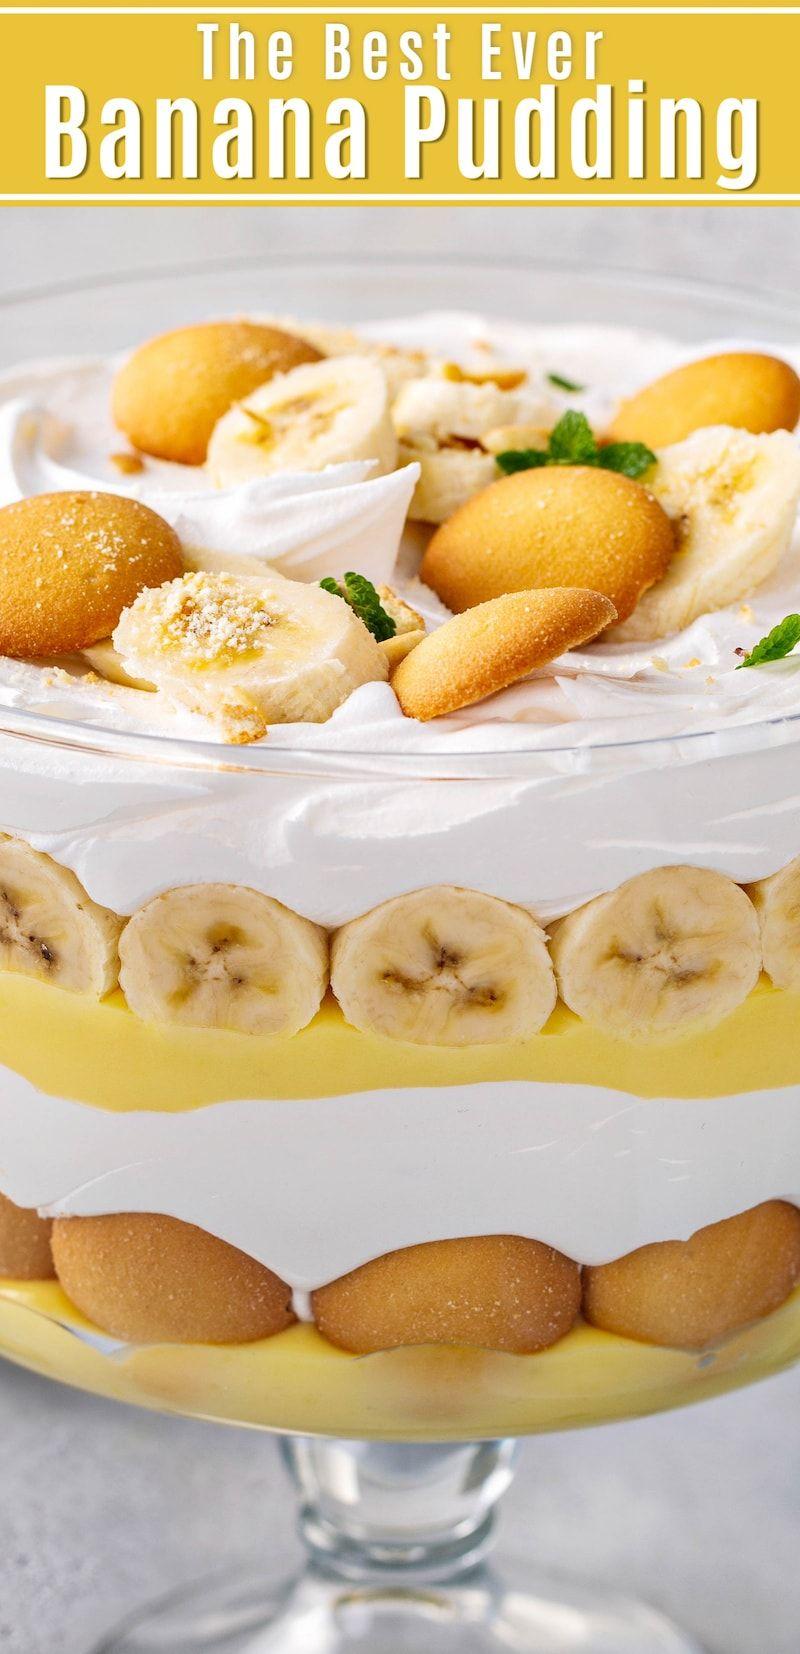 Easy Banana Pudding Recipe | The Best Homemade Banana Pudding!